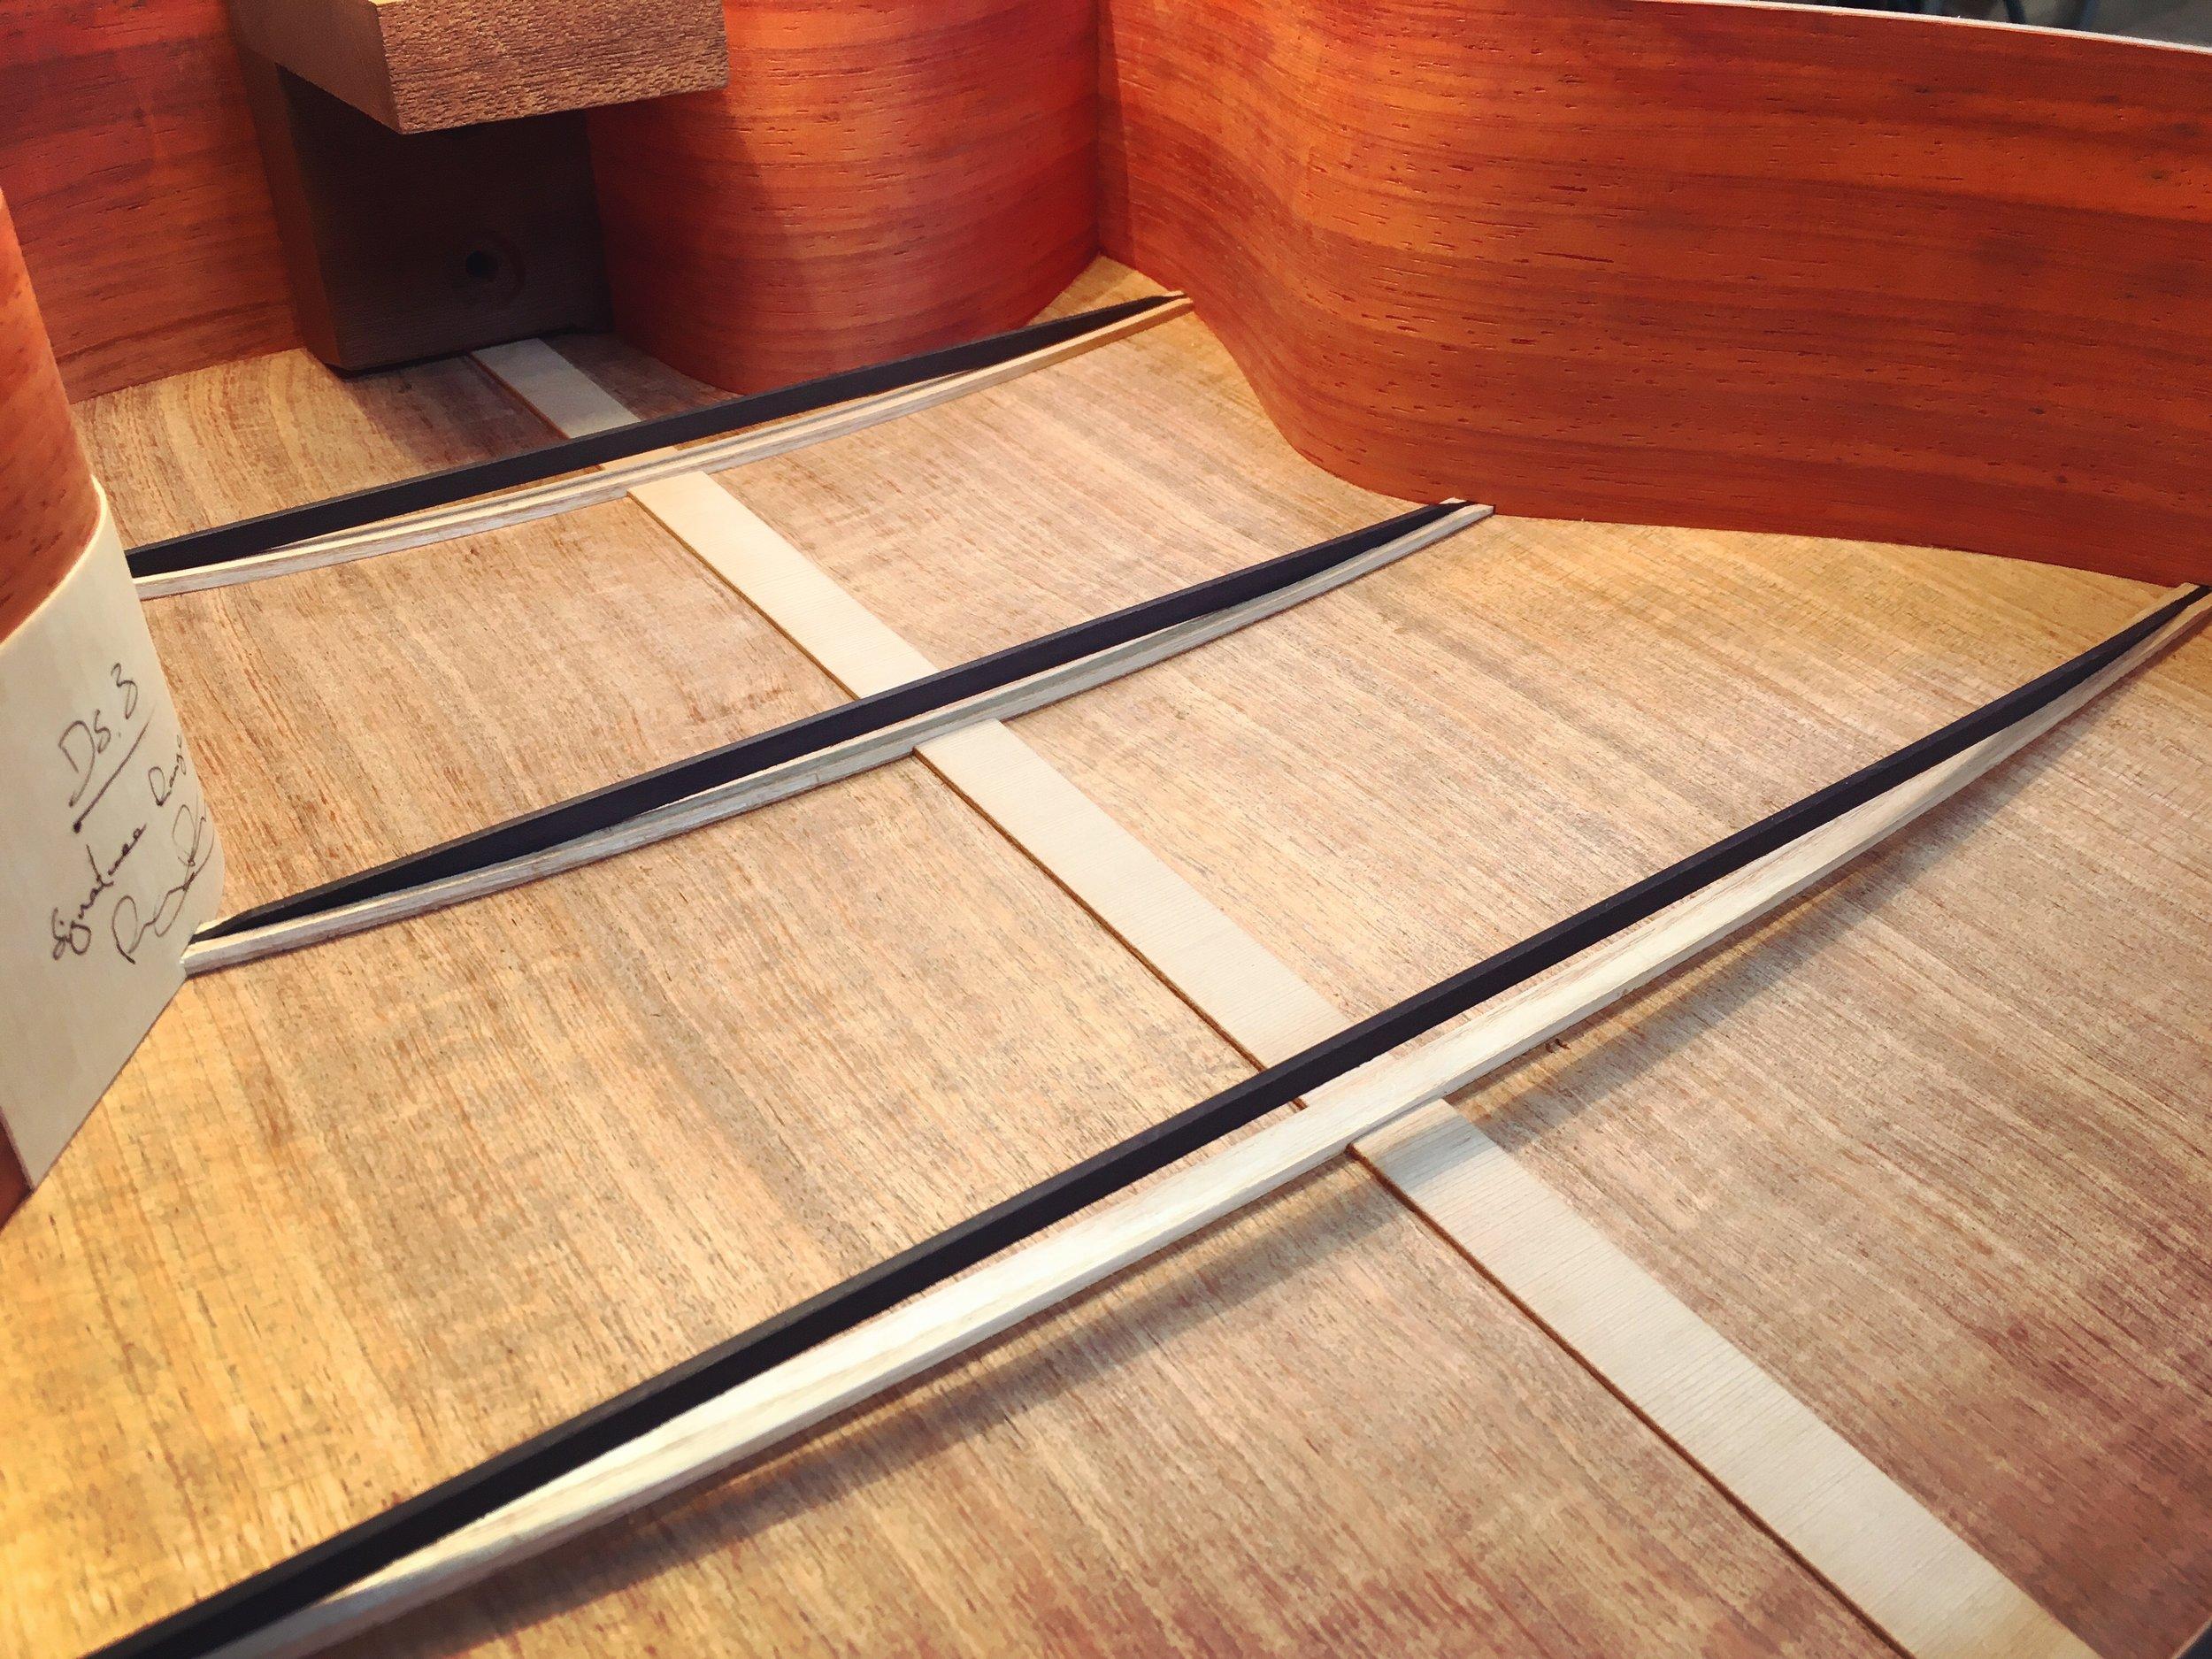 Copy of The first Compression Braces  Taran Guitars 03